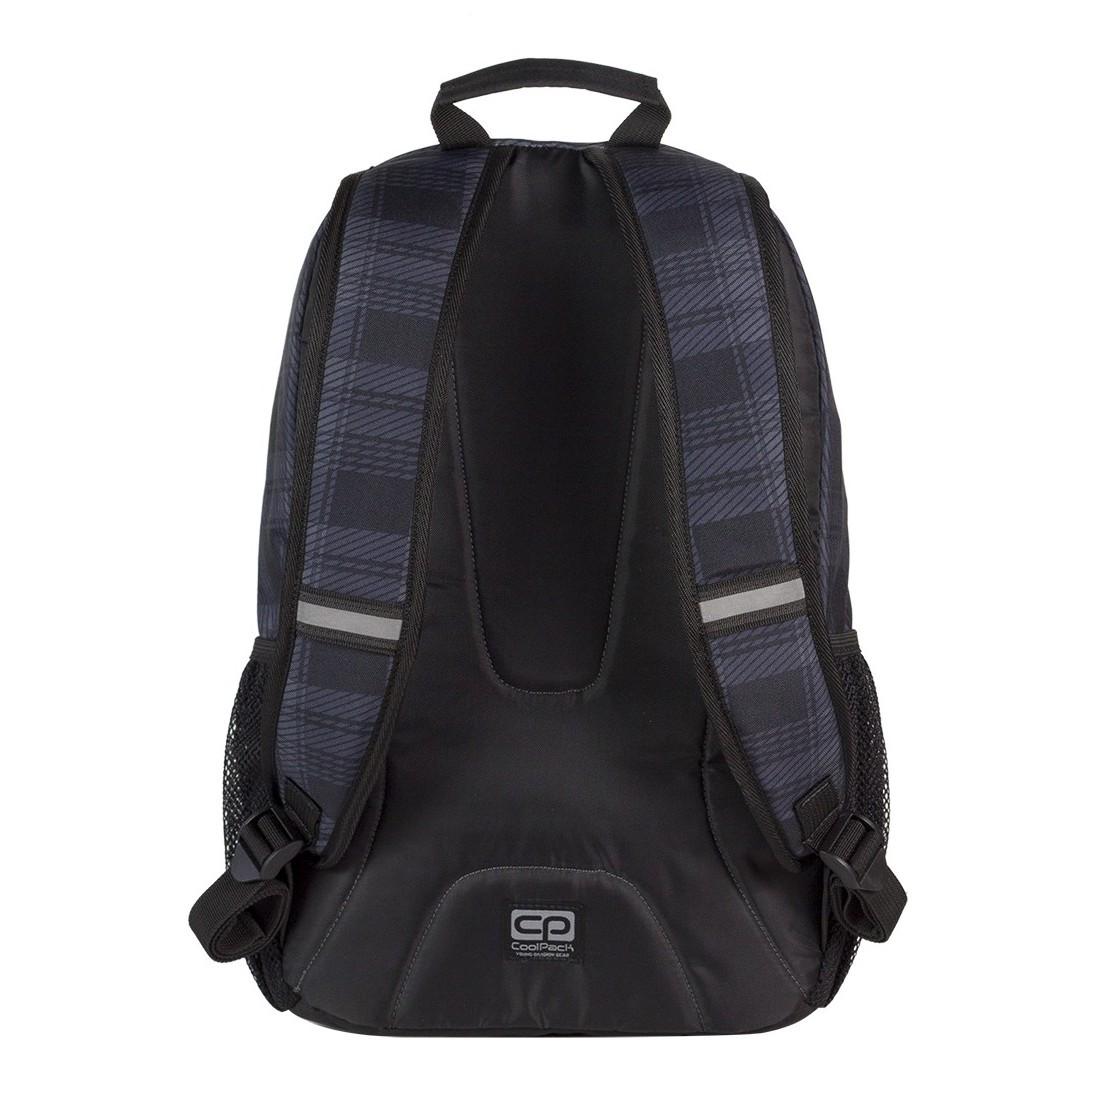 Plecak młodzieżowy CoolPack ACTION 2 przegrody DERBY CP 370 - plecak-tornister.pl